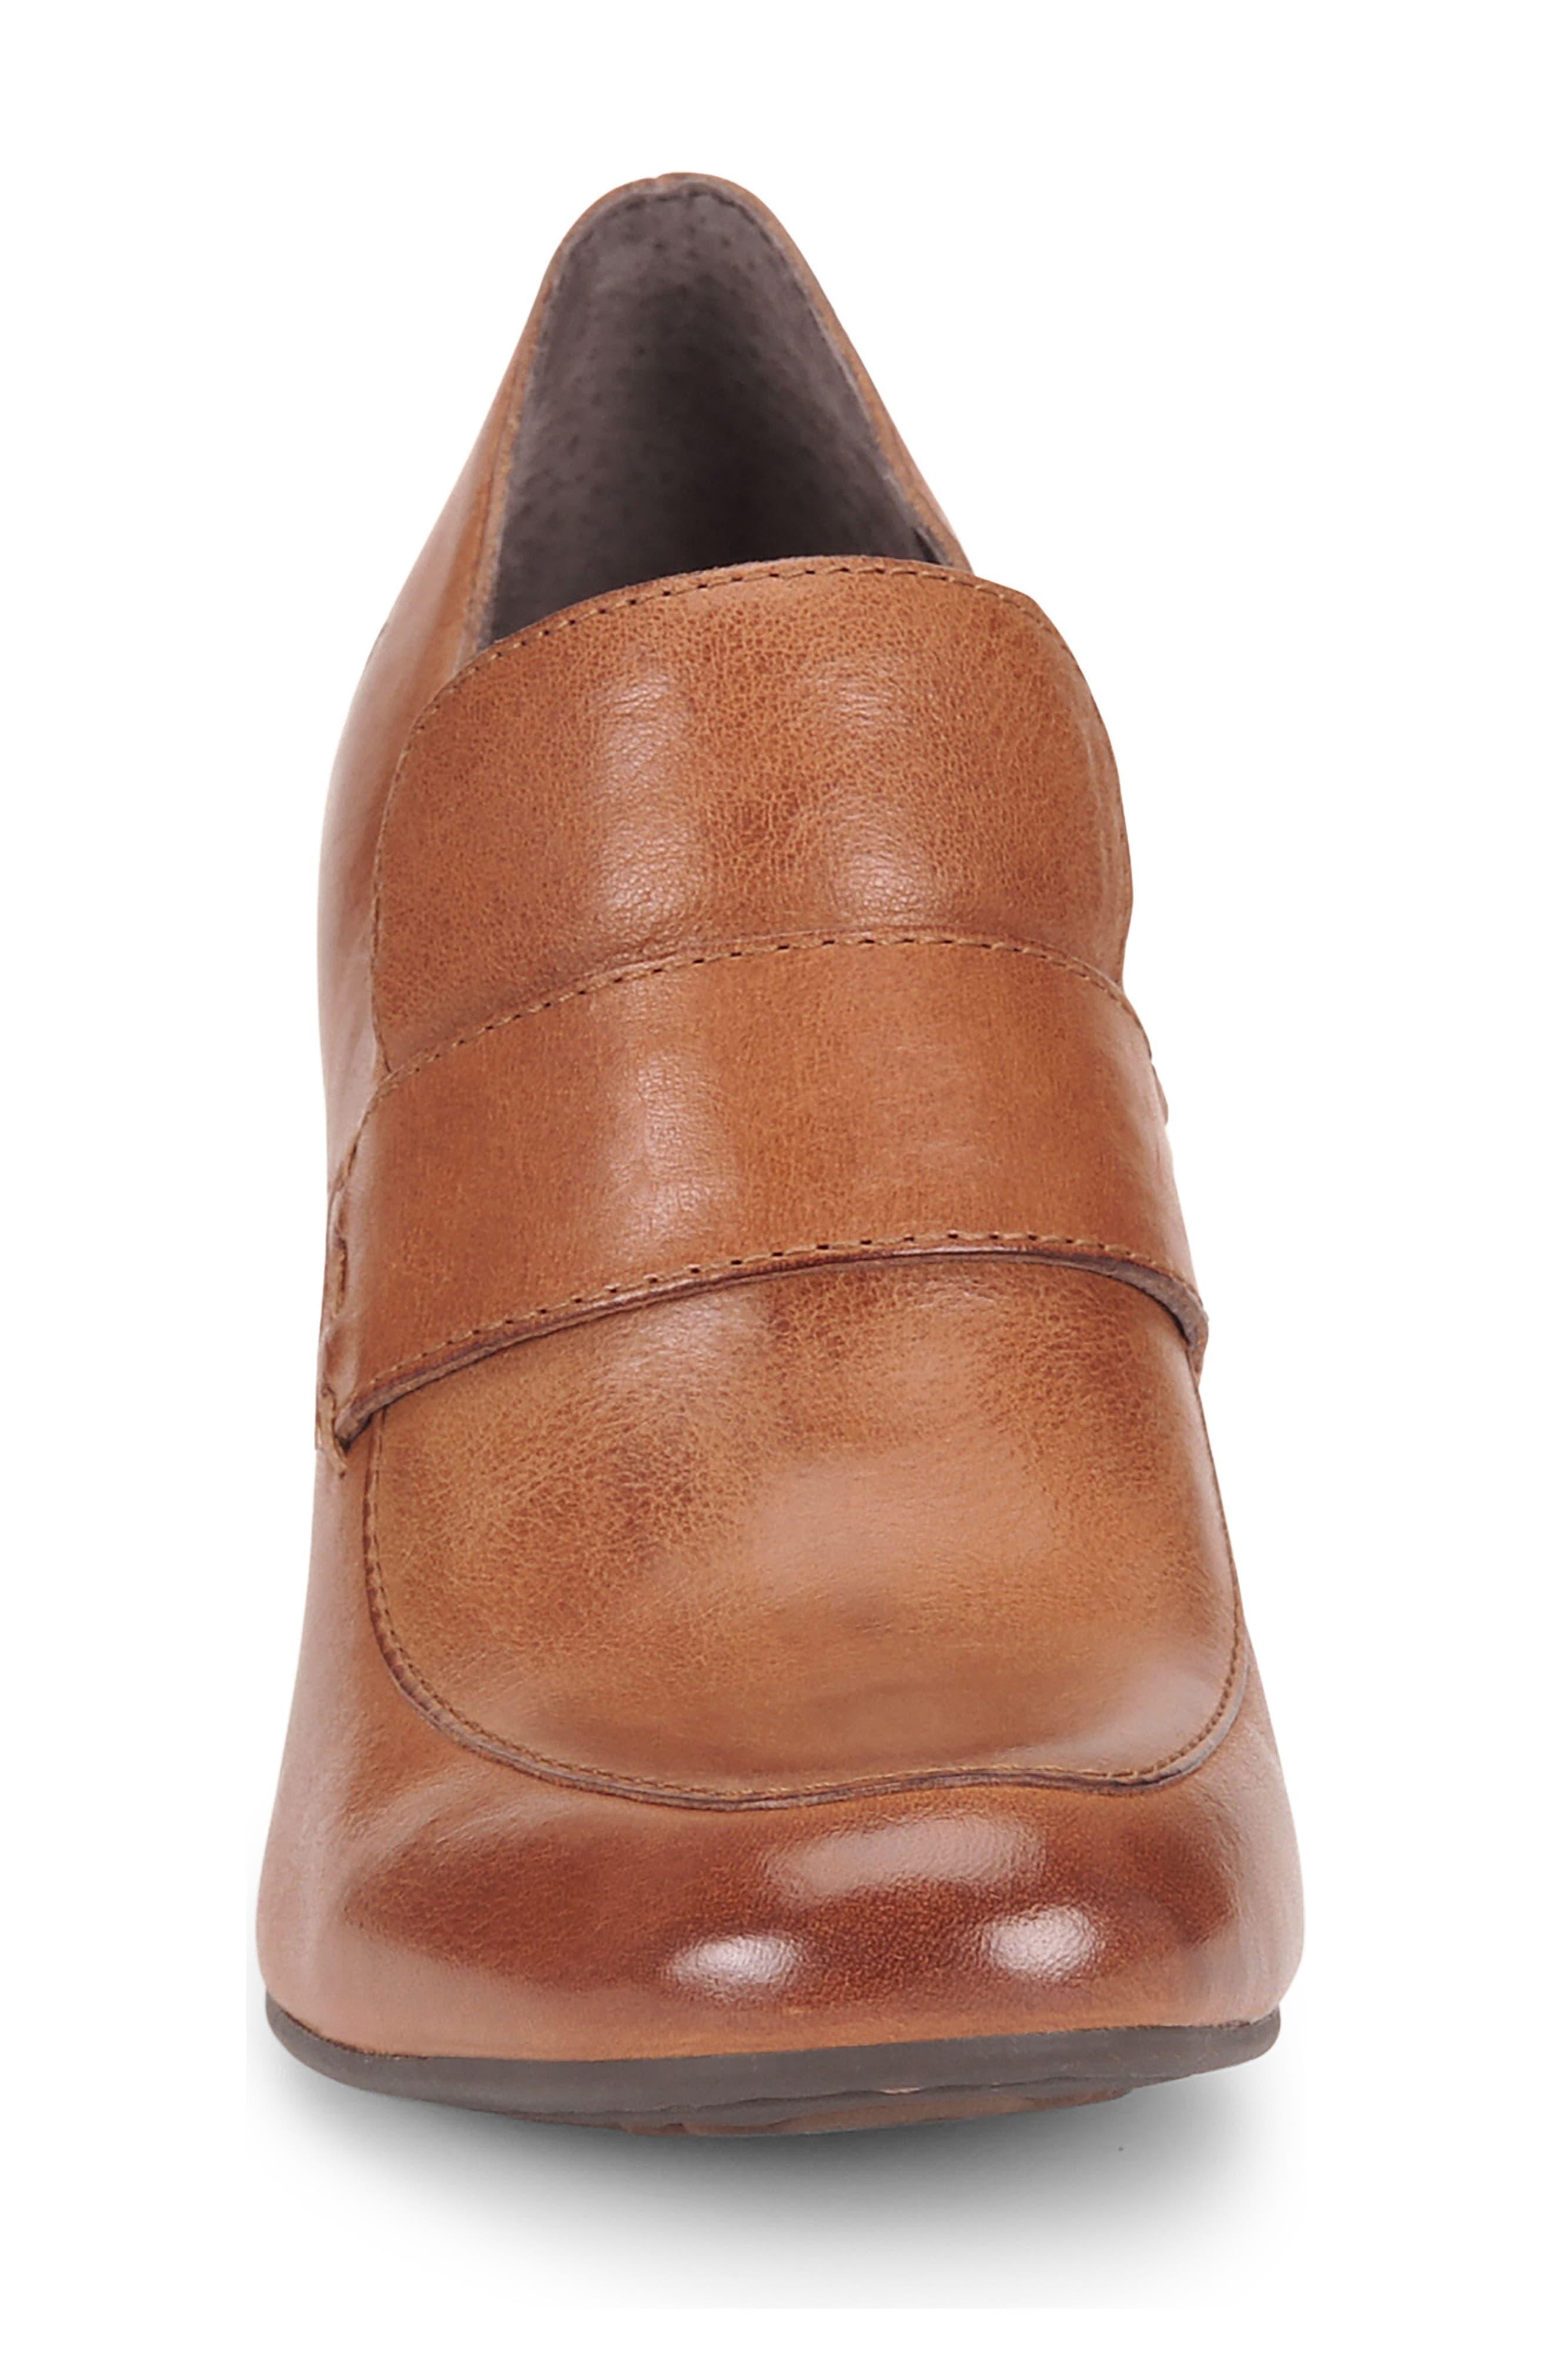 Mocho Pump,                             Alternate thumbnail 4, color,                             Tan Leather